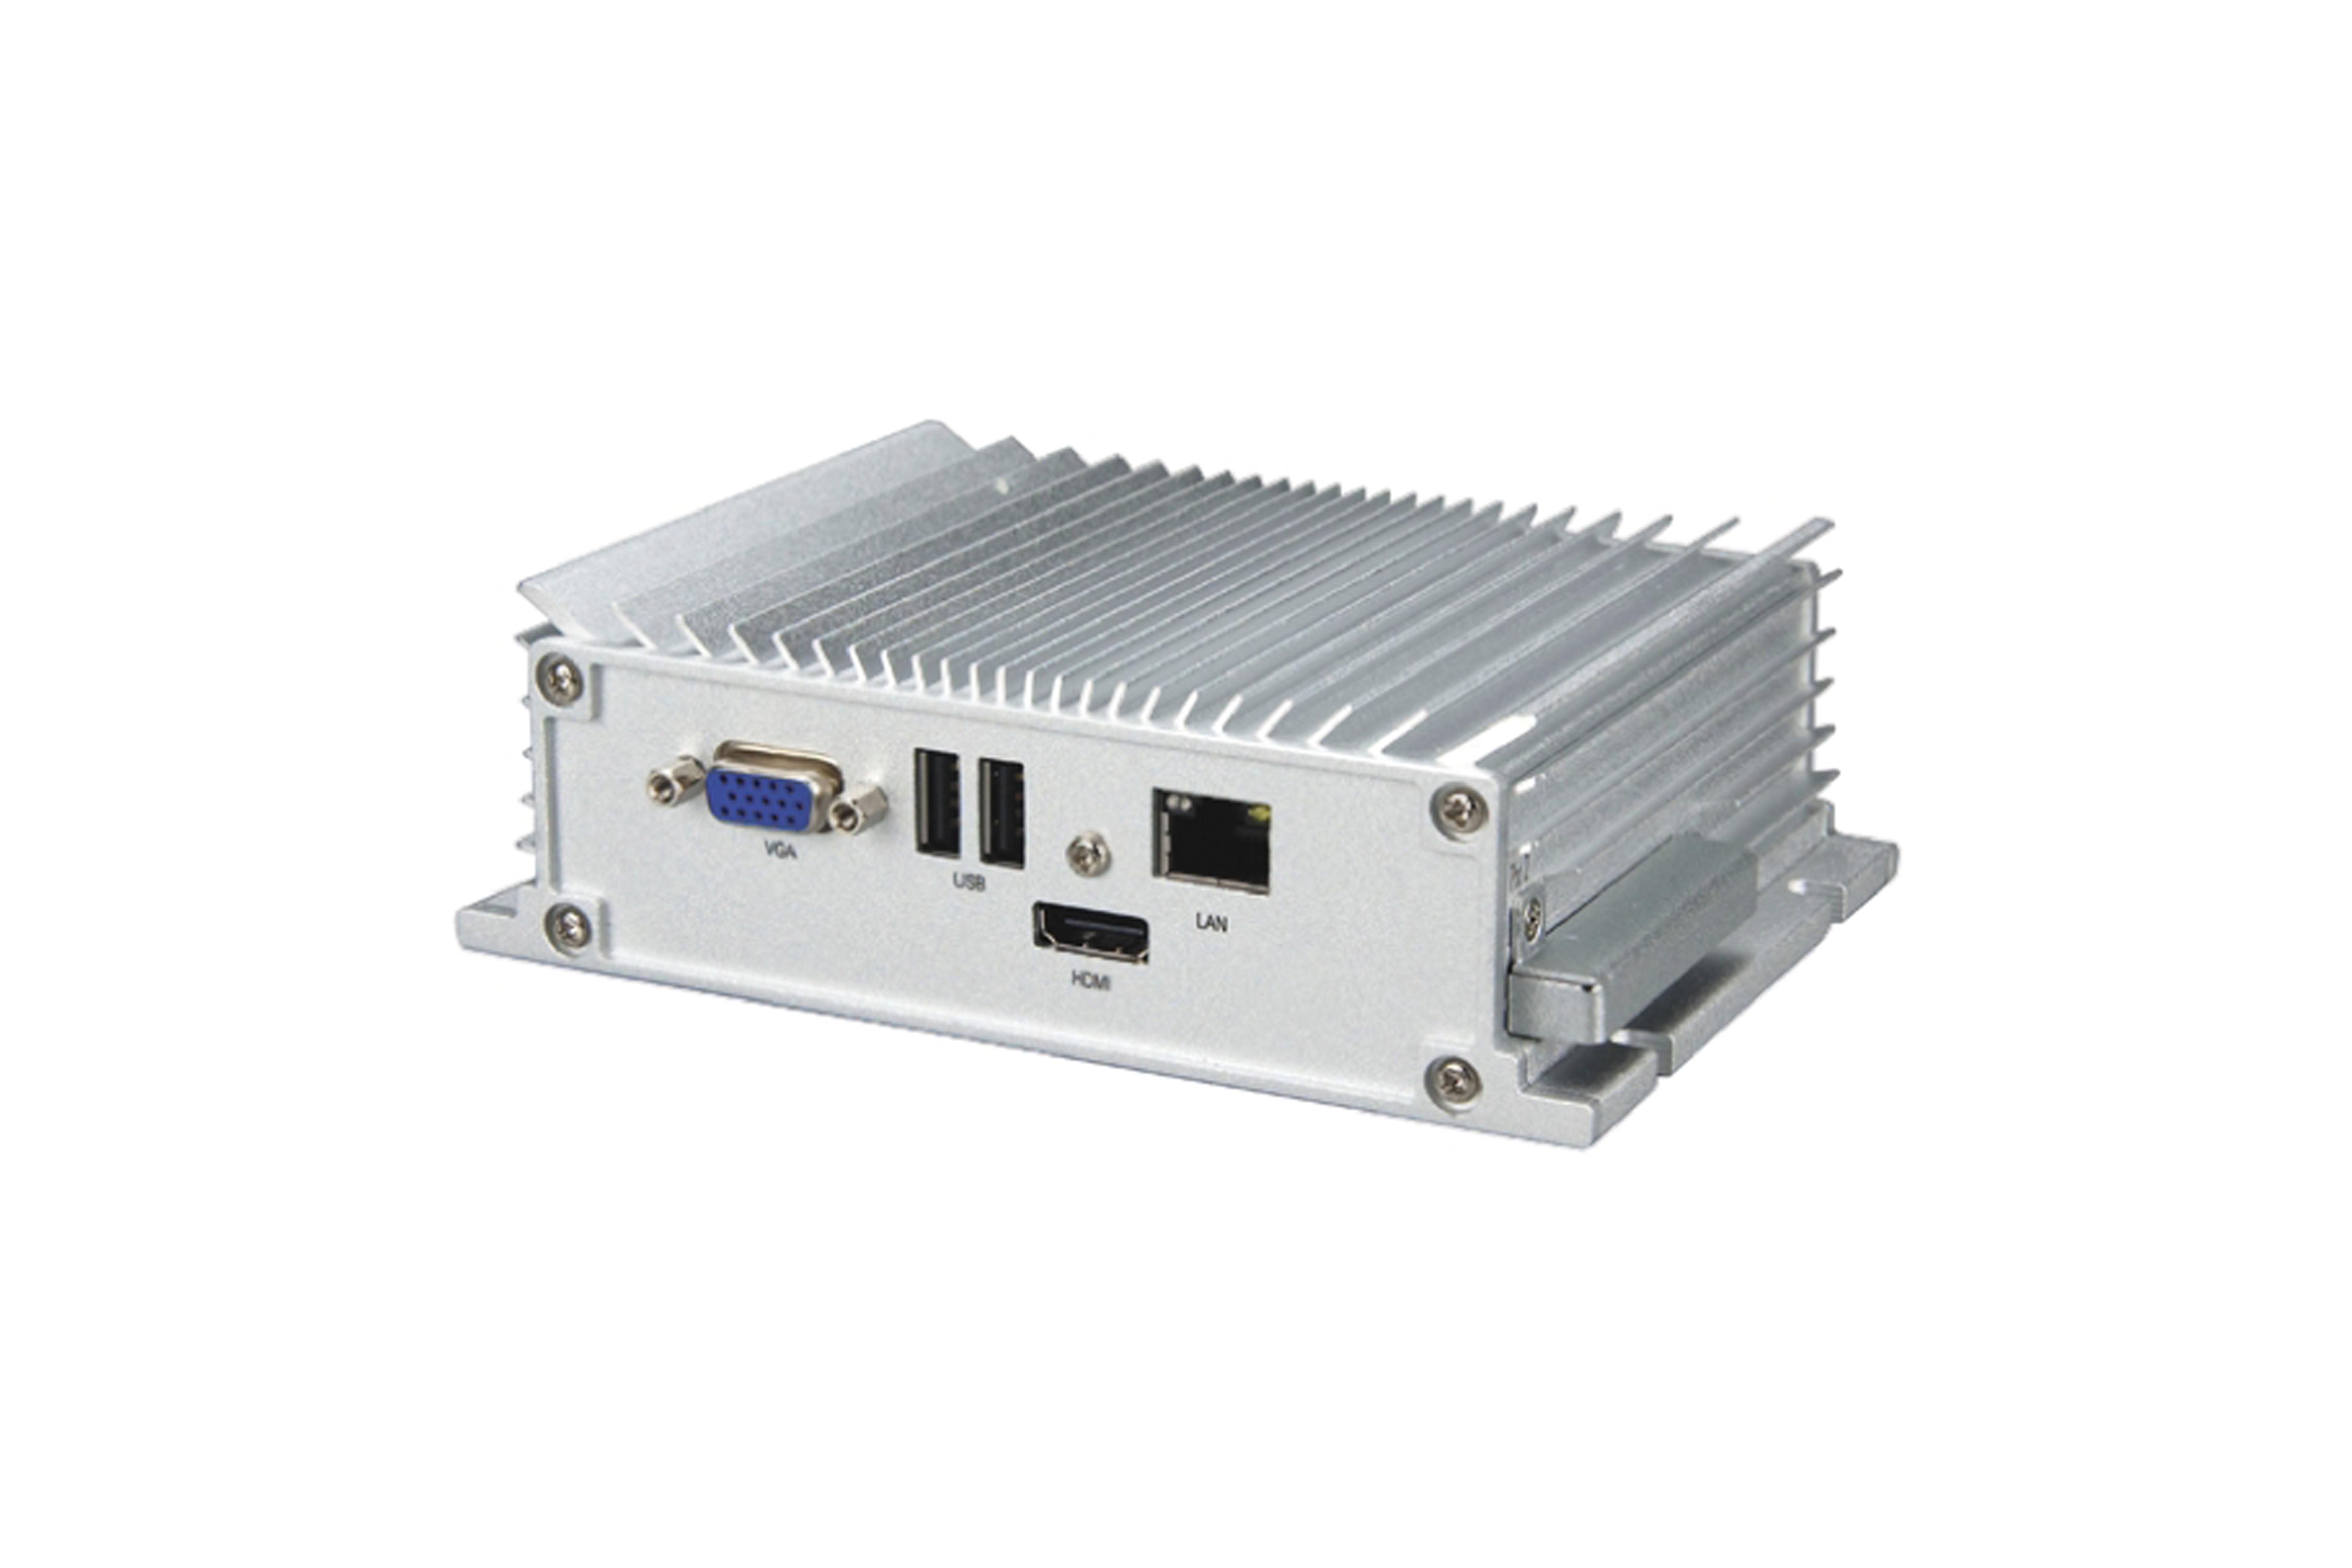 Chassis ohne Lüfter 1.2 GHz Nano CPU VGA HDMI